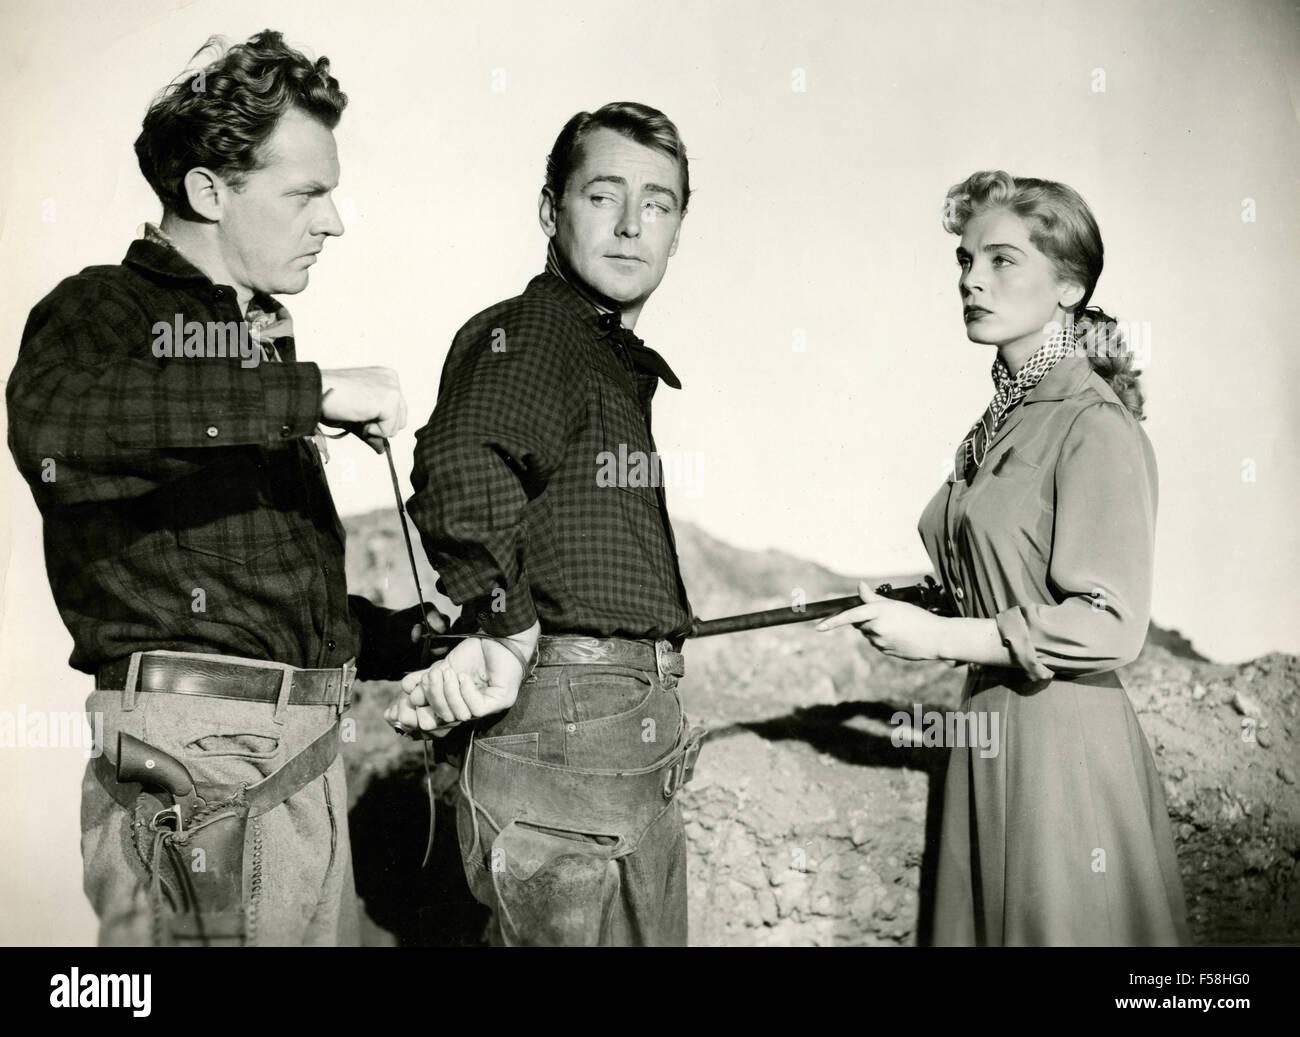 Alan Ladd, Lizabeth Scott and Arthur Kennedy in Red Mountain - Stock Image